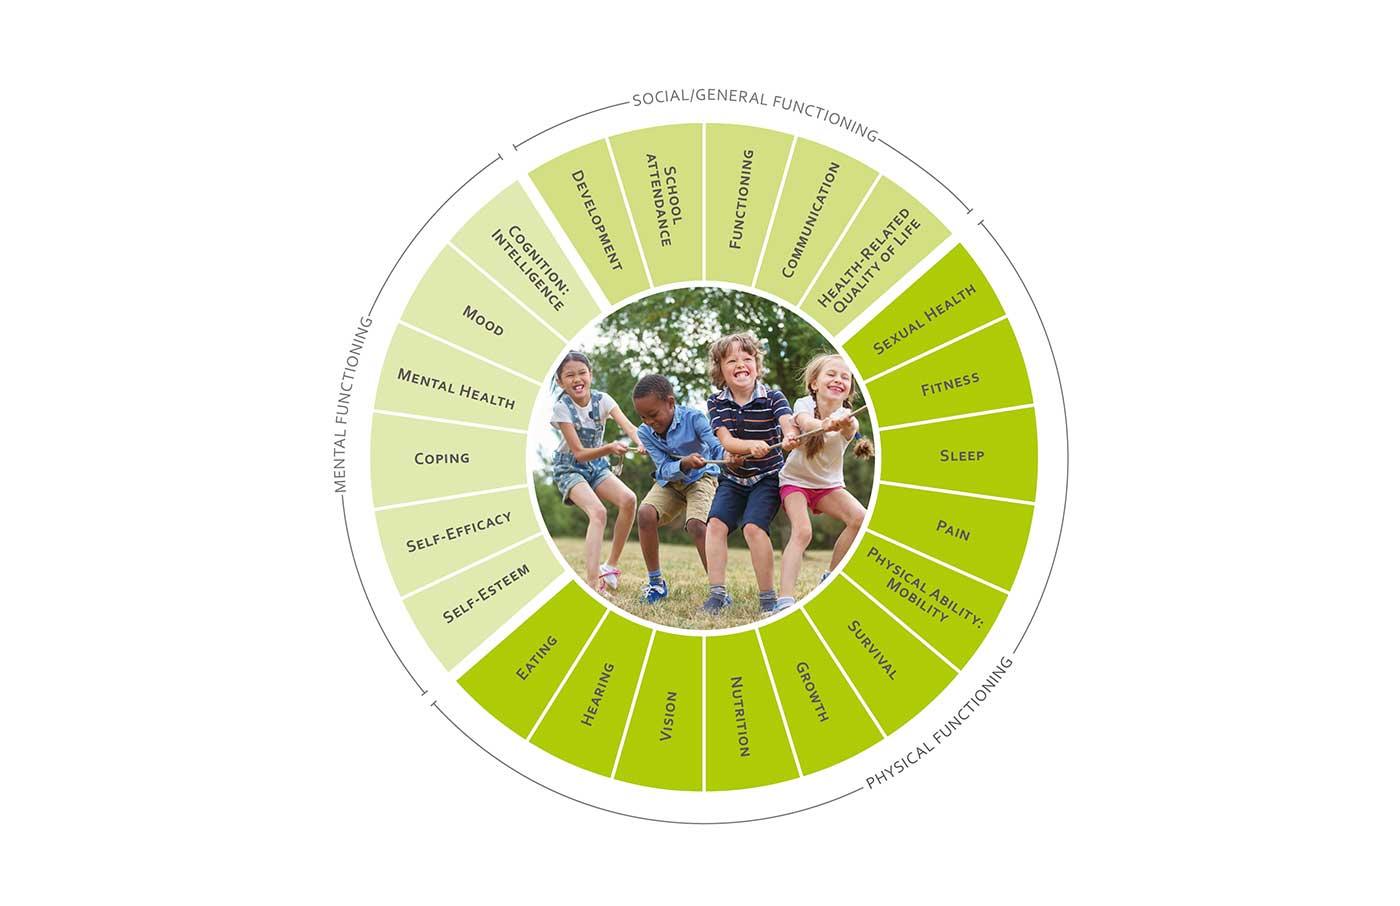 ICHOM Standard Sets Overall Paediatric Health Outcomes Wheel